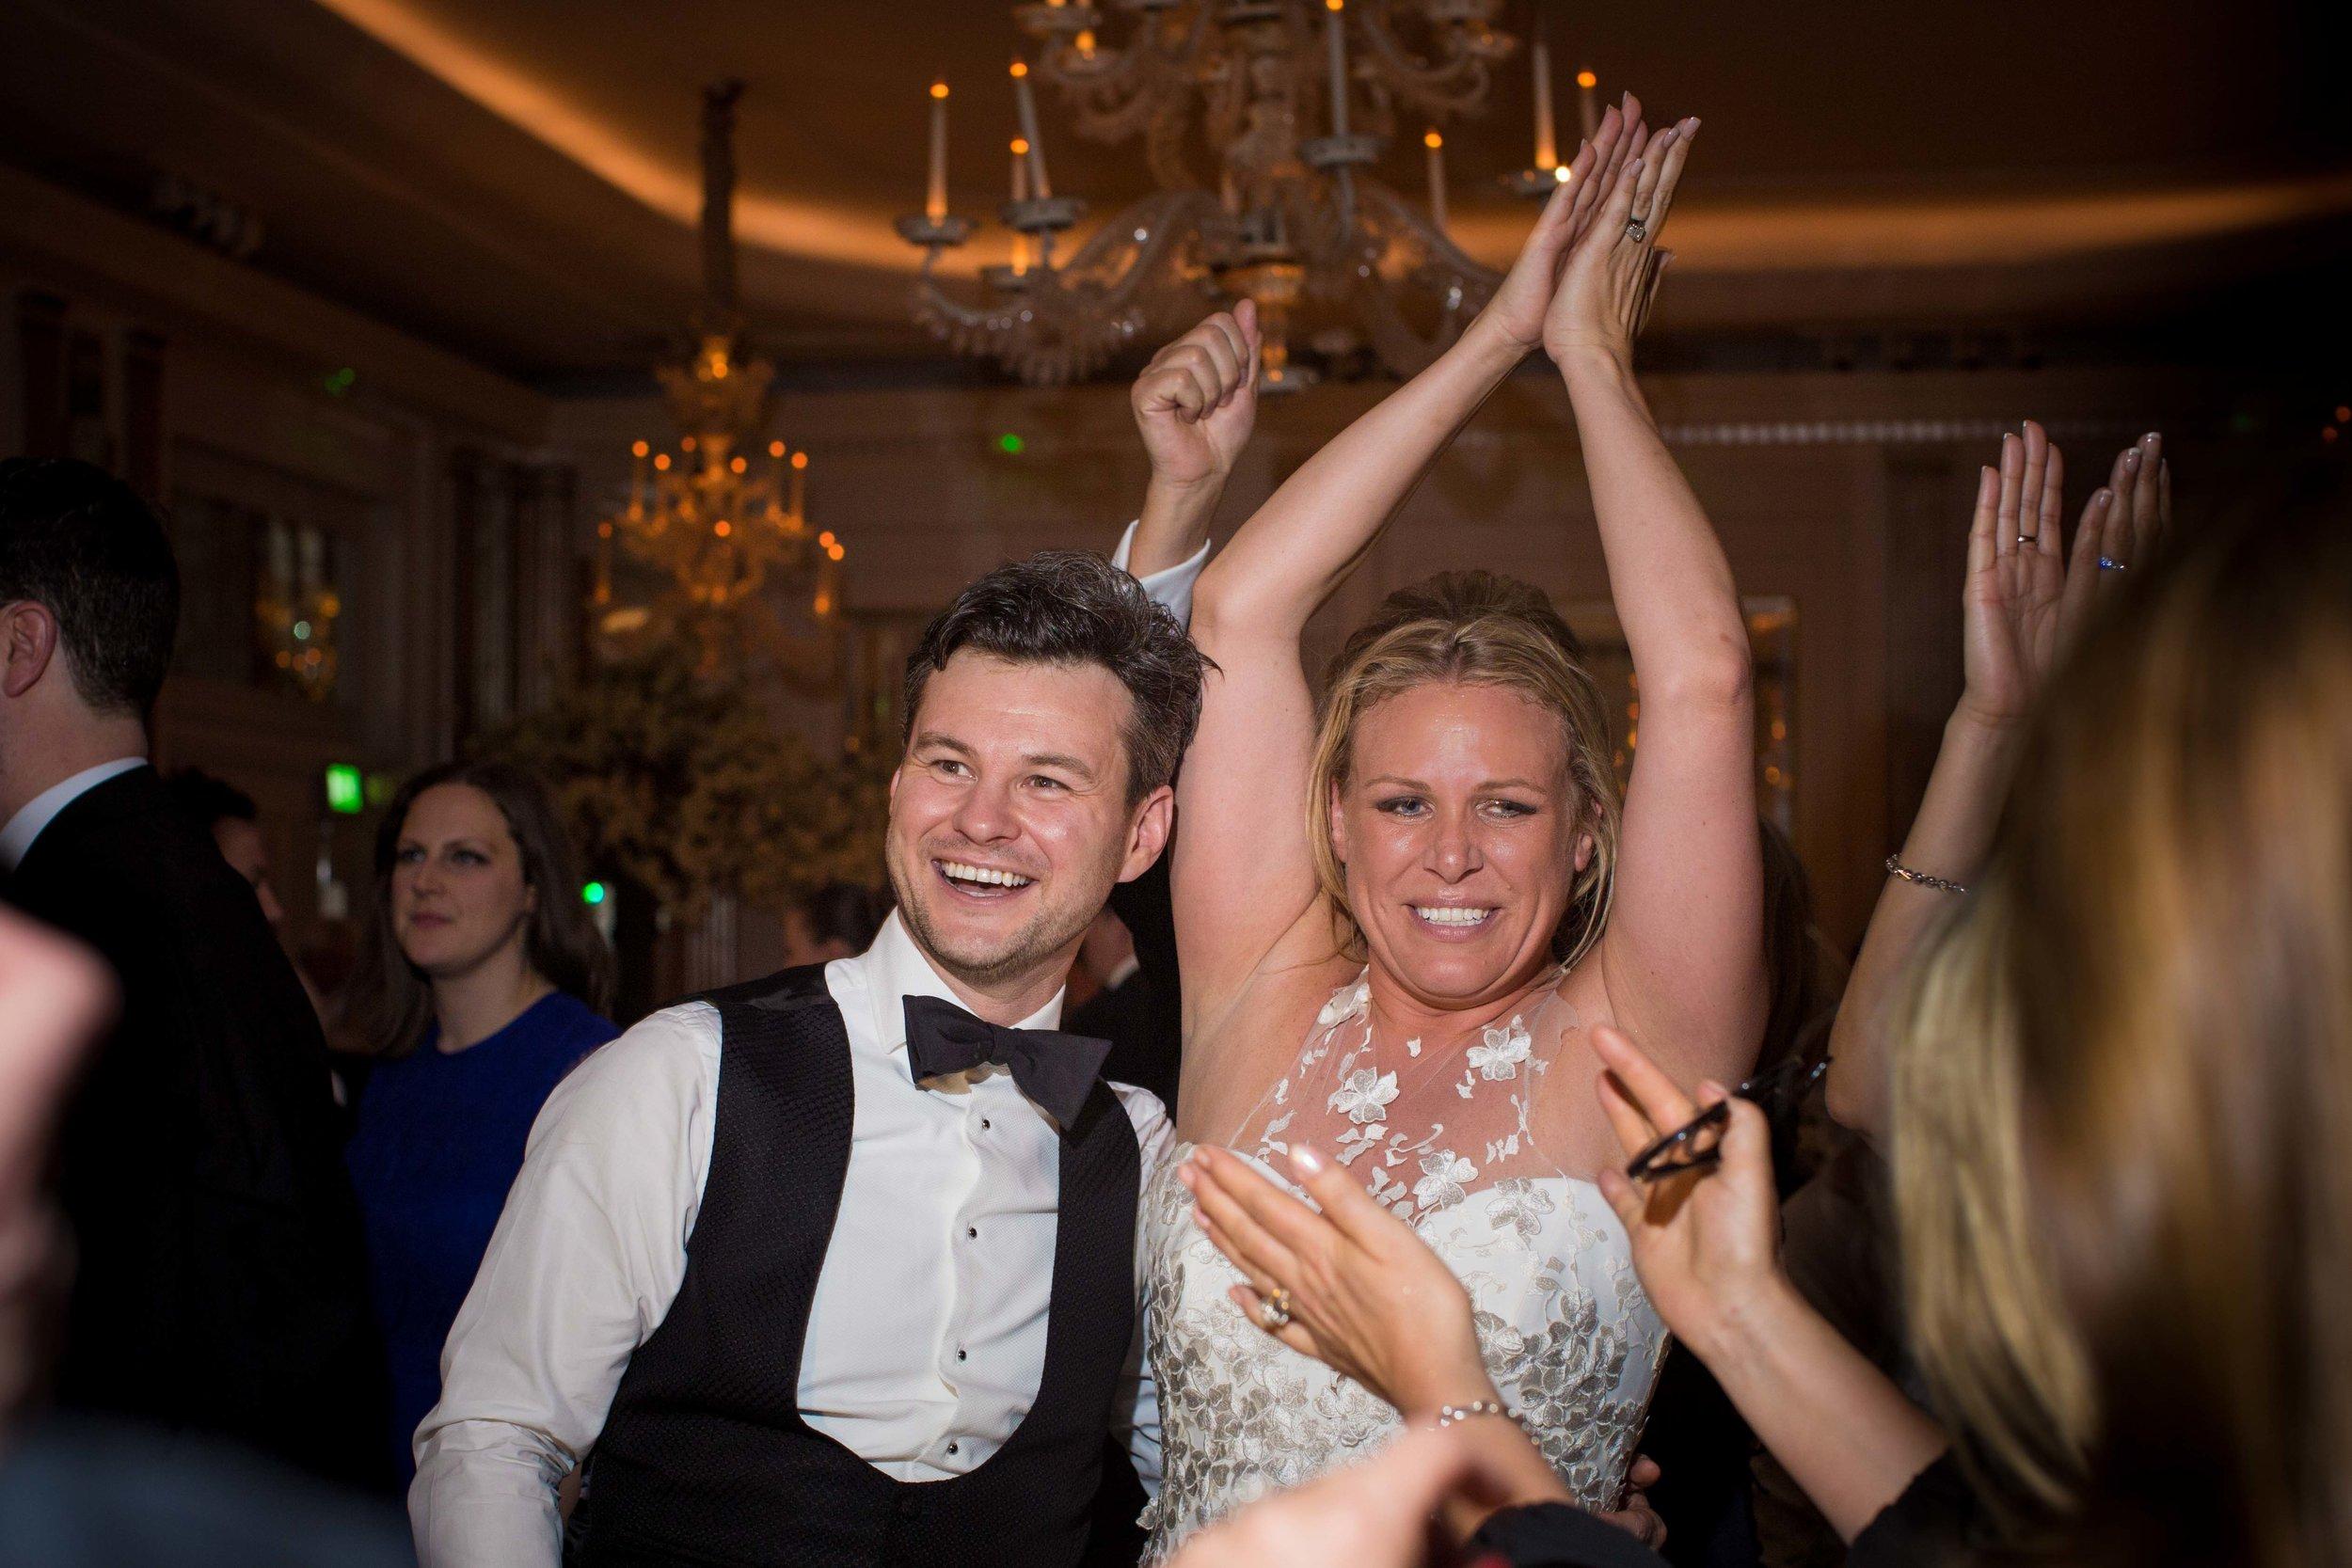 claridges-hotel-wedding-photographer-london-mayfair-natalia-smith-photography-148.jpg